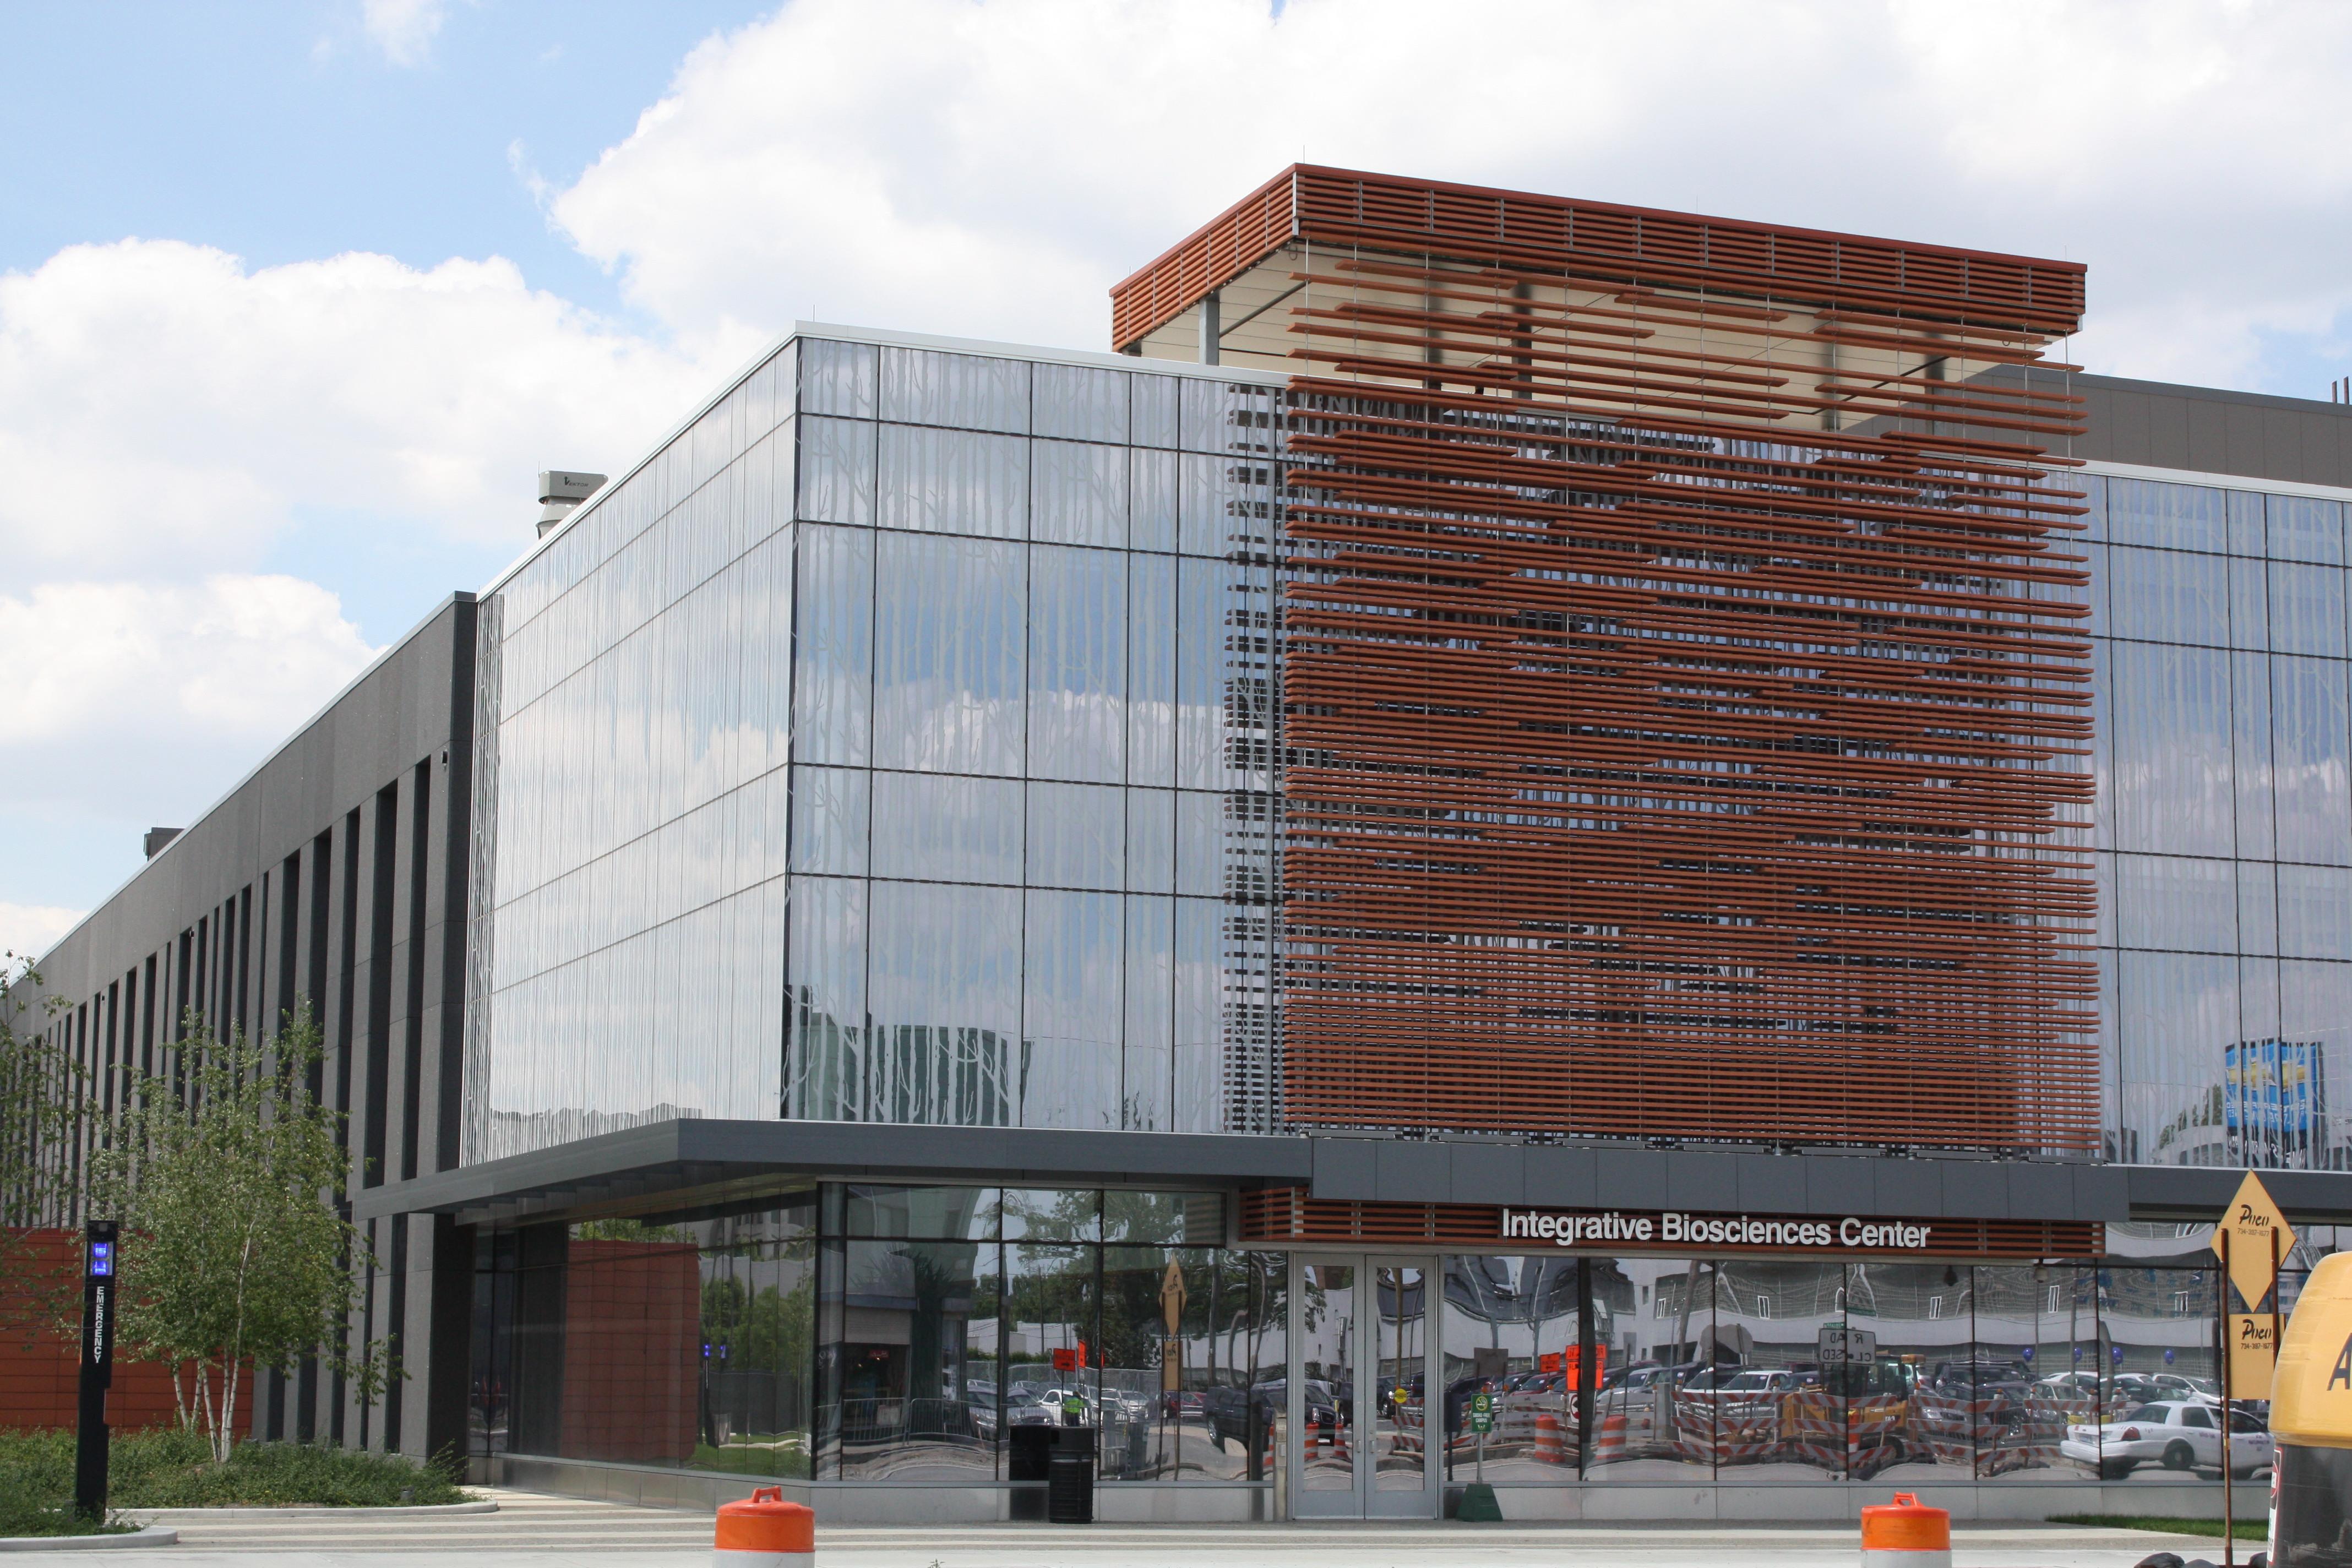 Wayne State University Integrative Bioscience Center - Detroit, MI